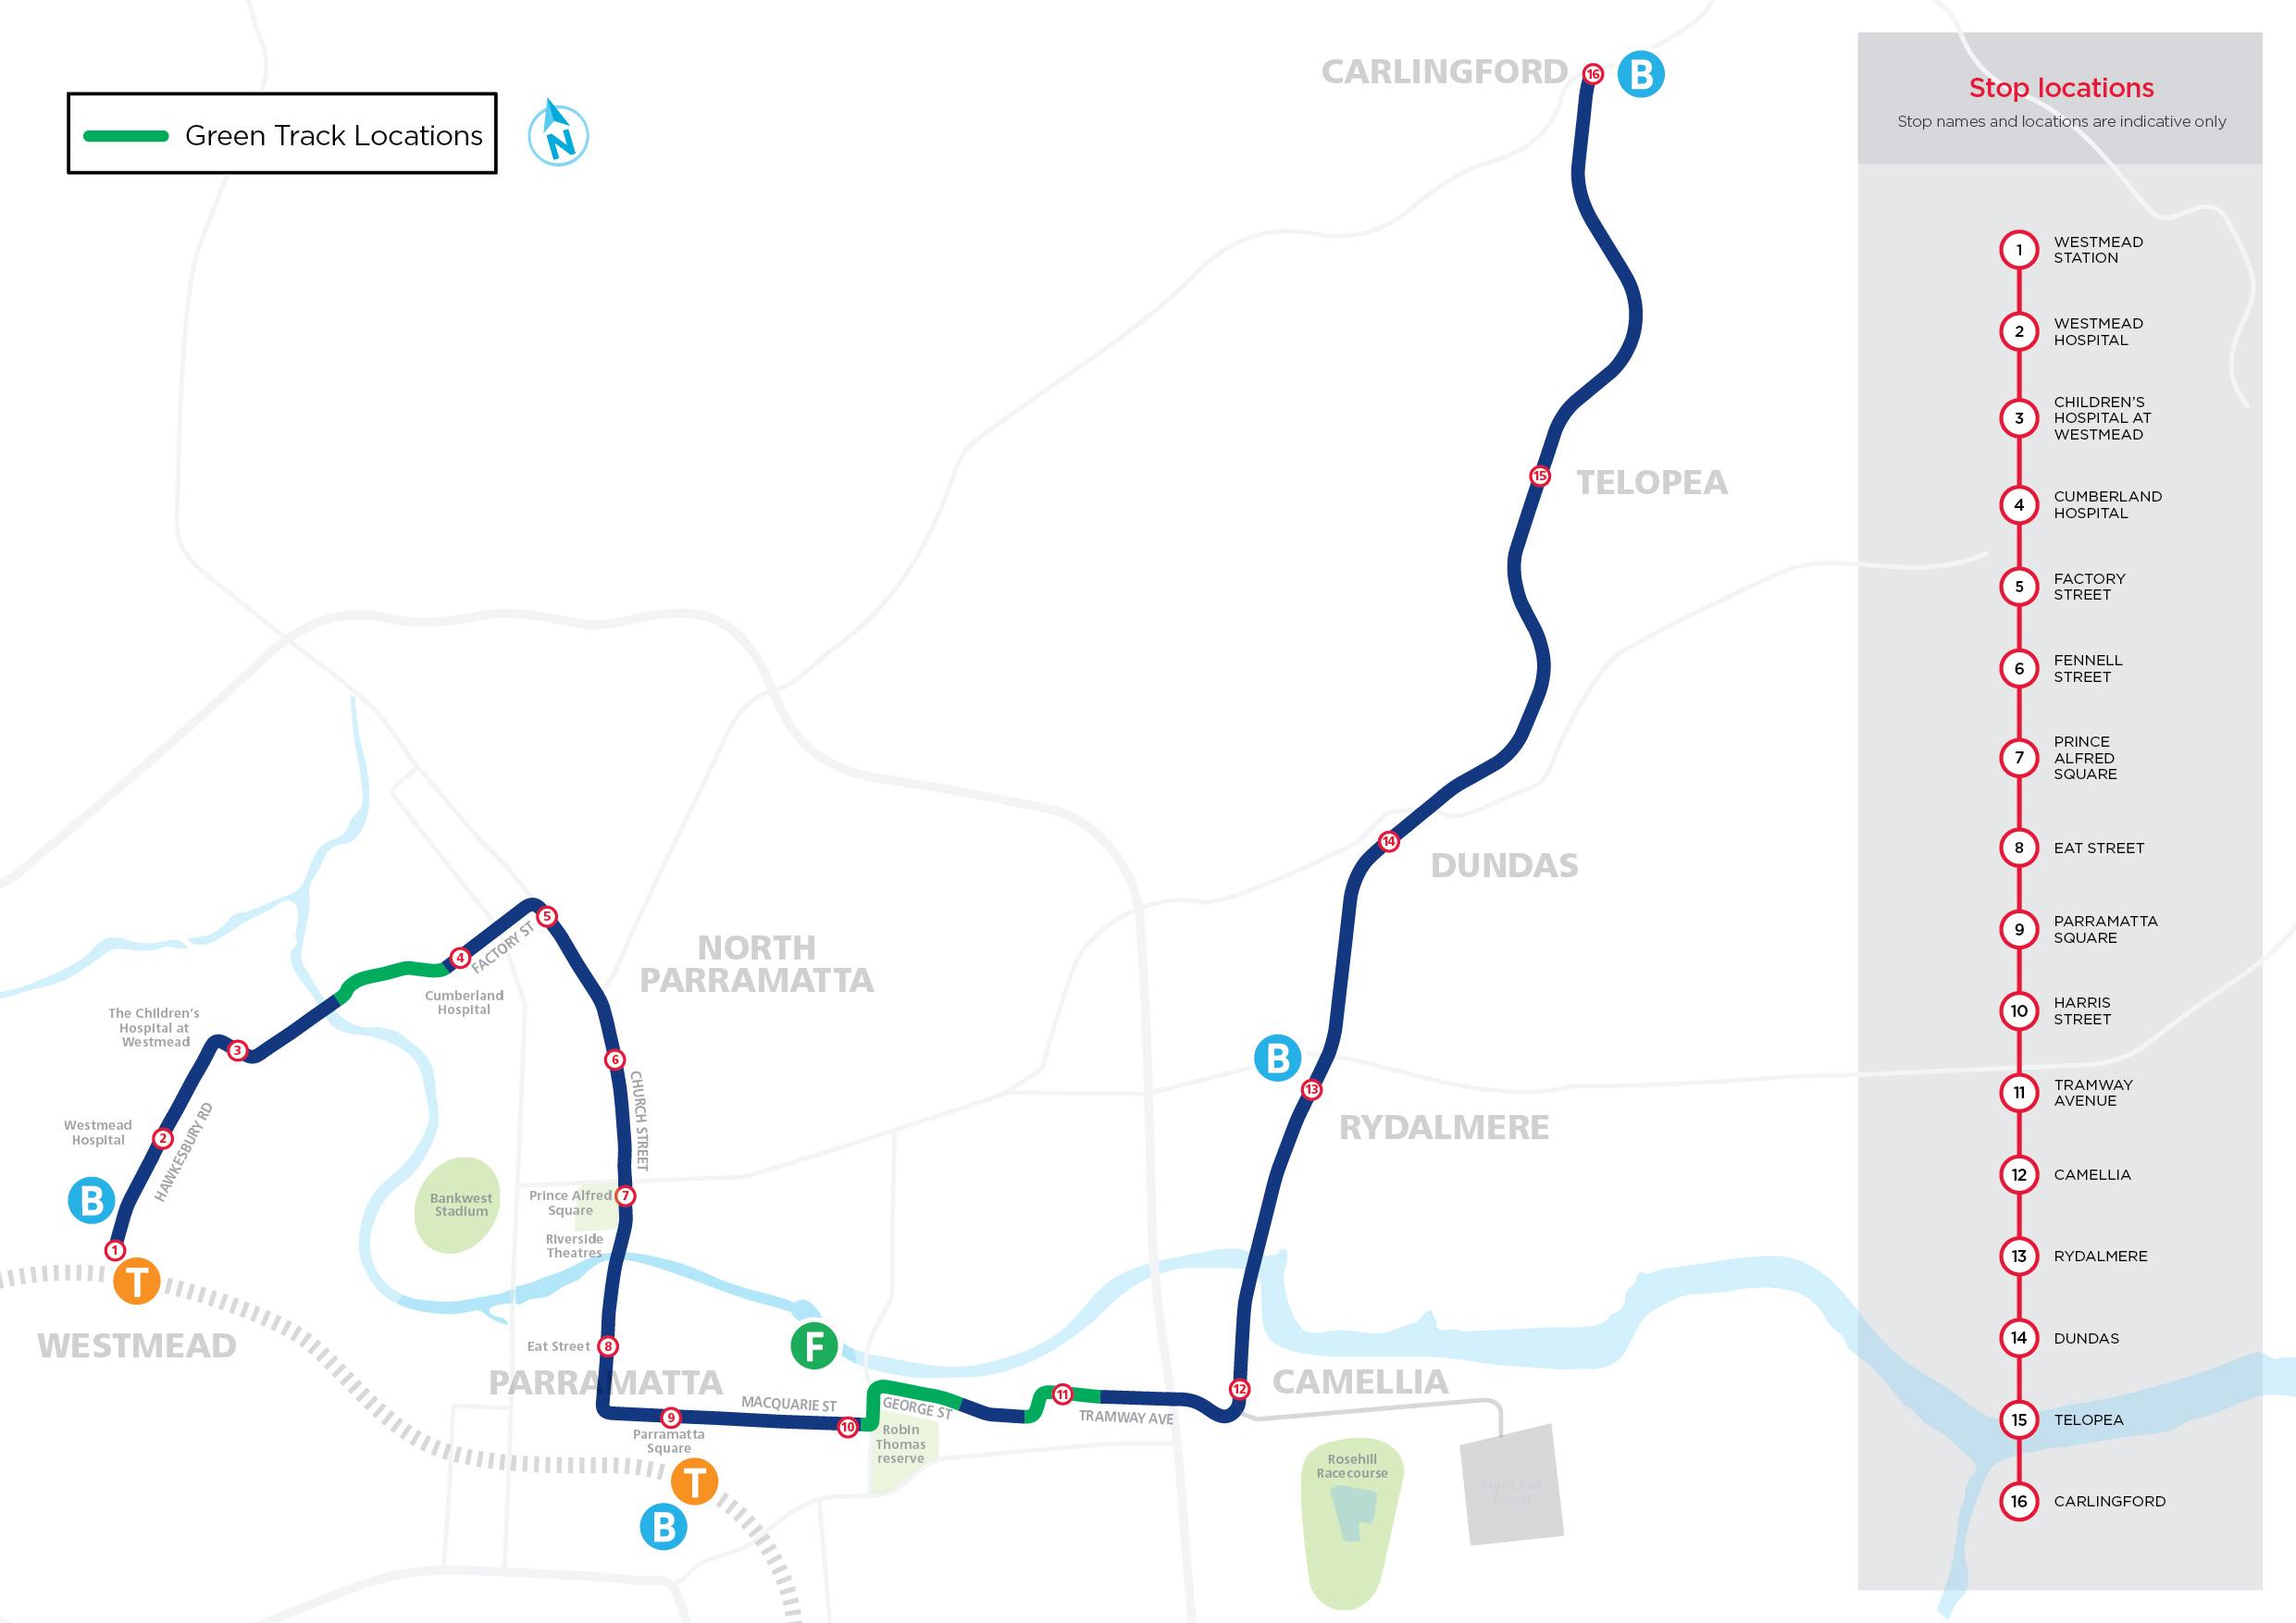 Parramatta Green Track Locations